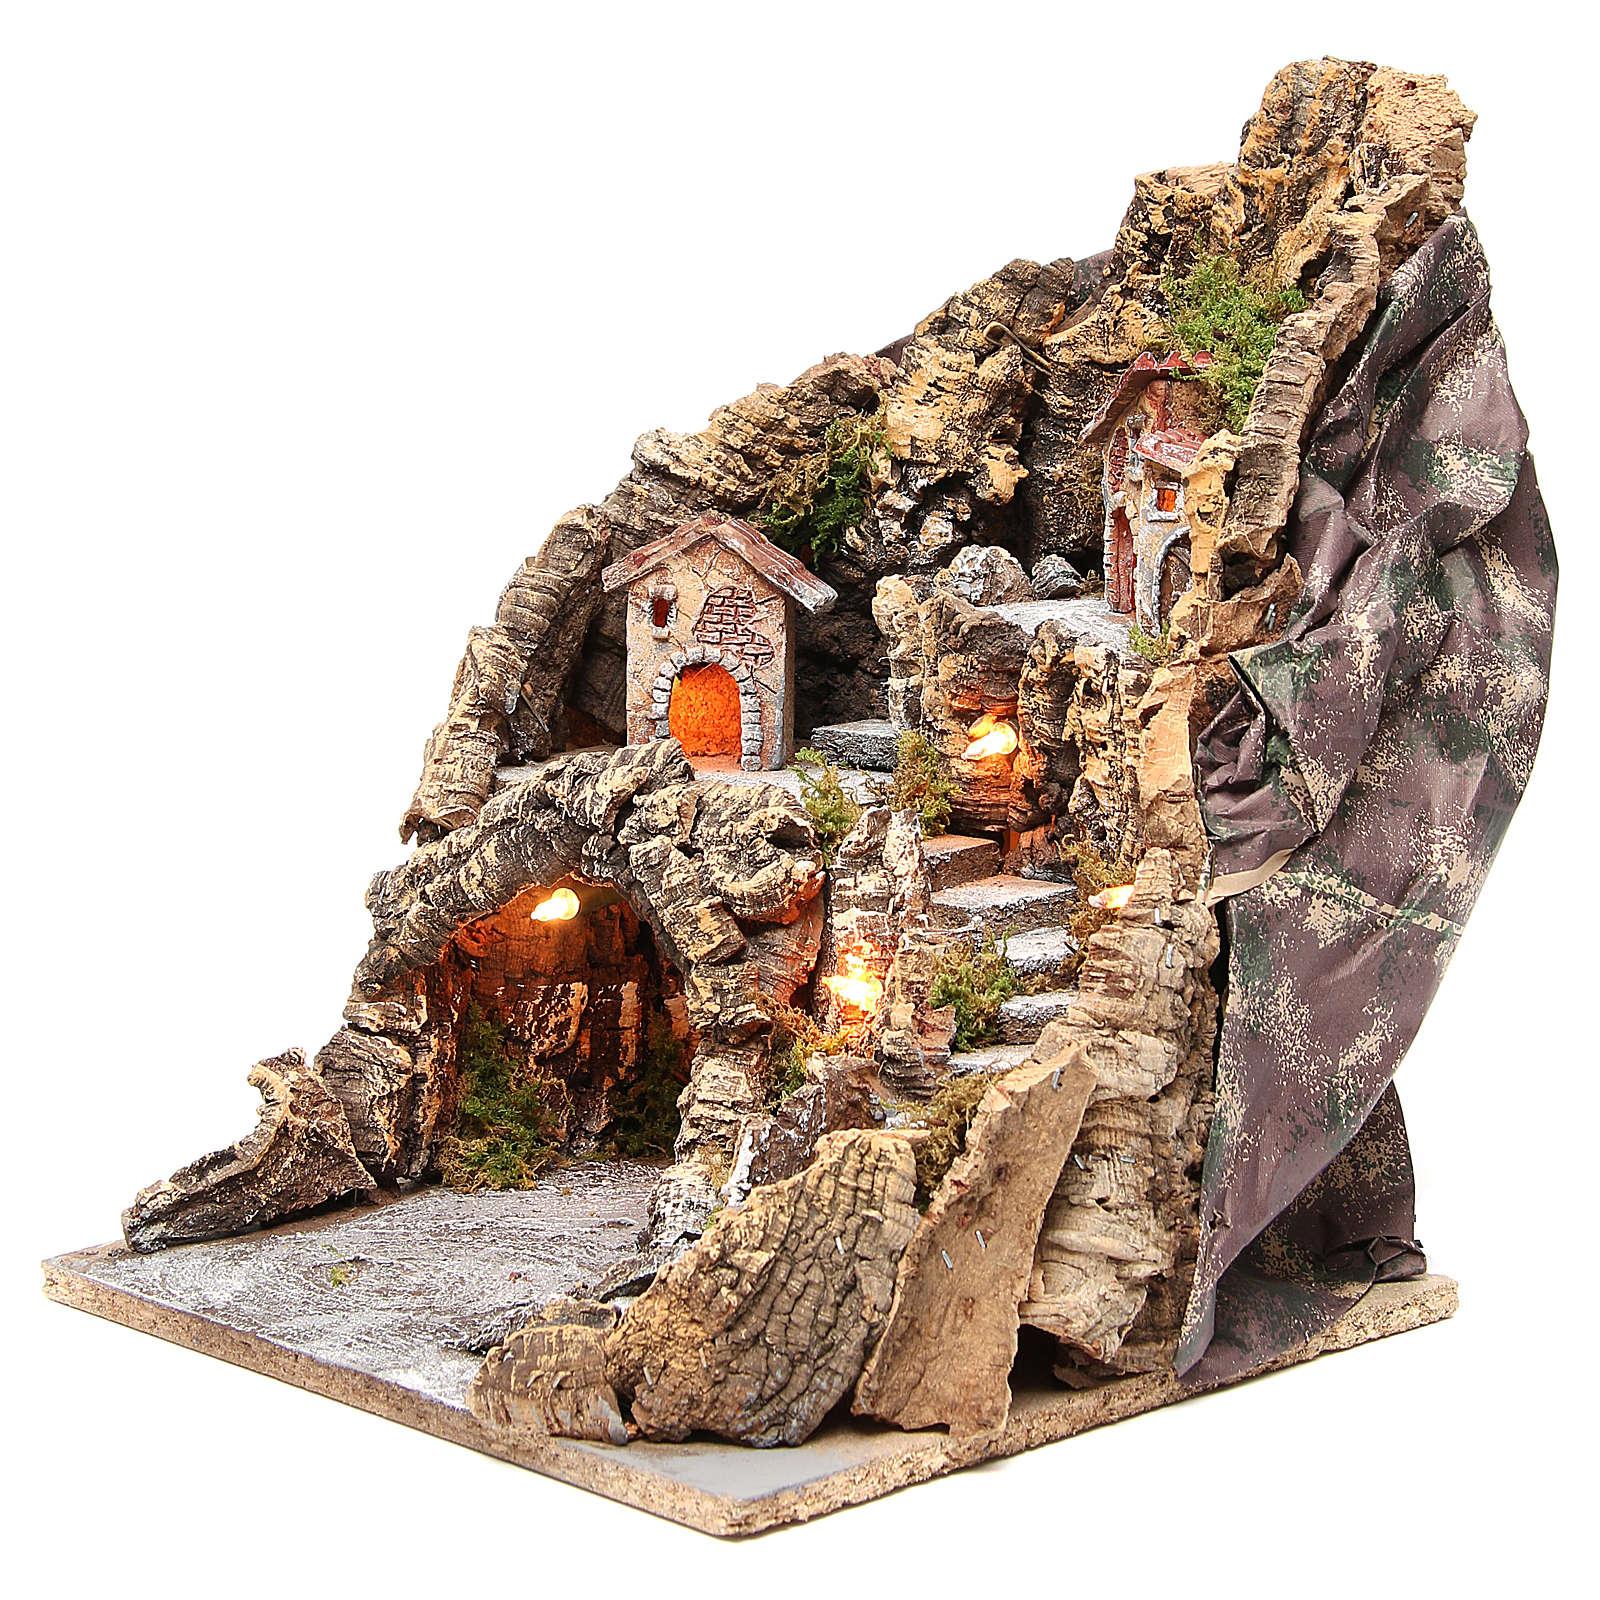 Illuminated Neapolitan nativity scene with cave 37x28x34 cm 4